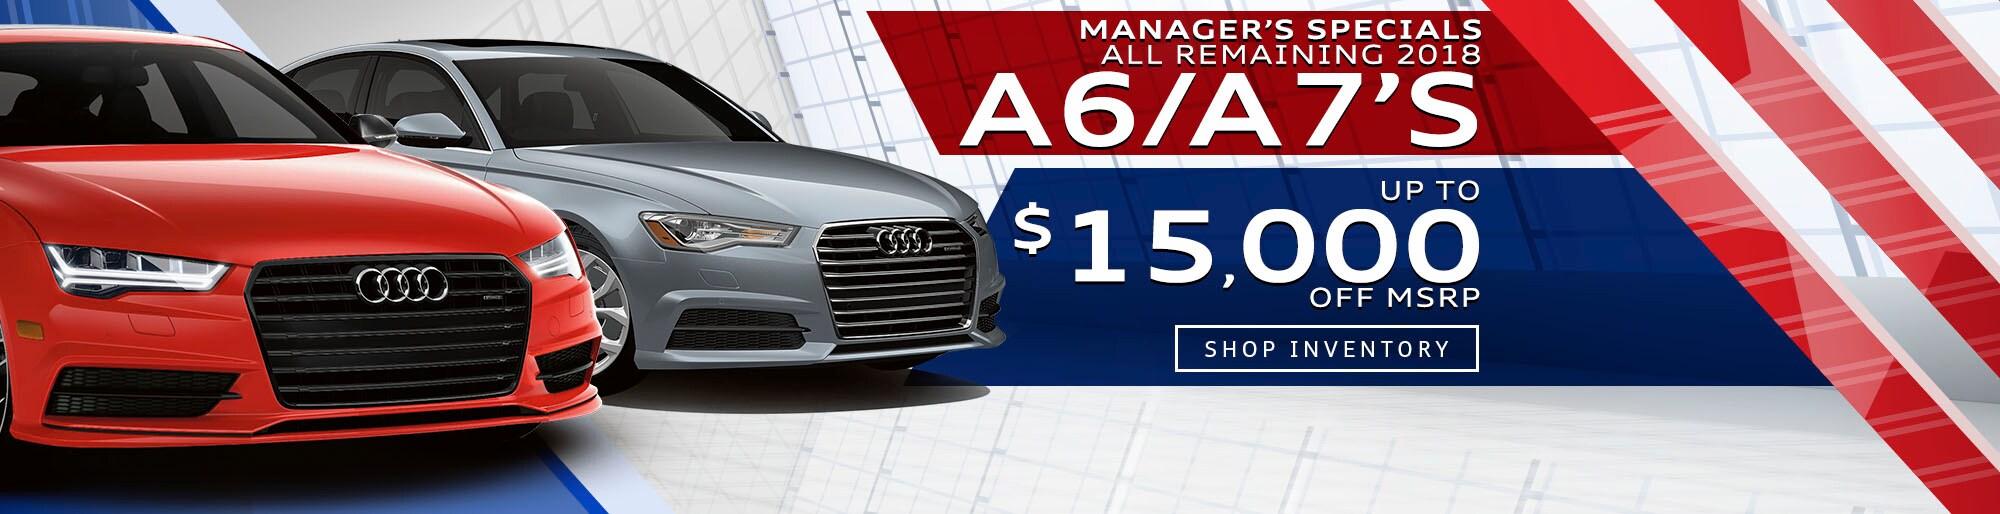 Car Dealerships In Pensacola Fl >> Audi Pensacola: Audi Dealership in Pensacola, FL